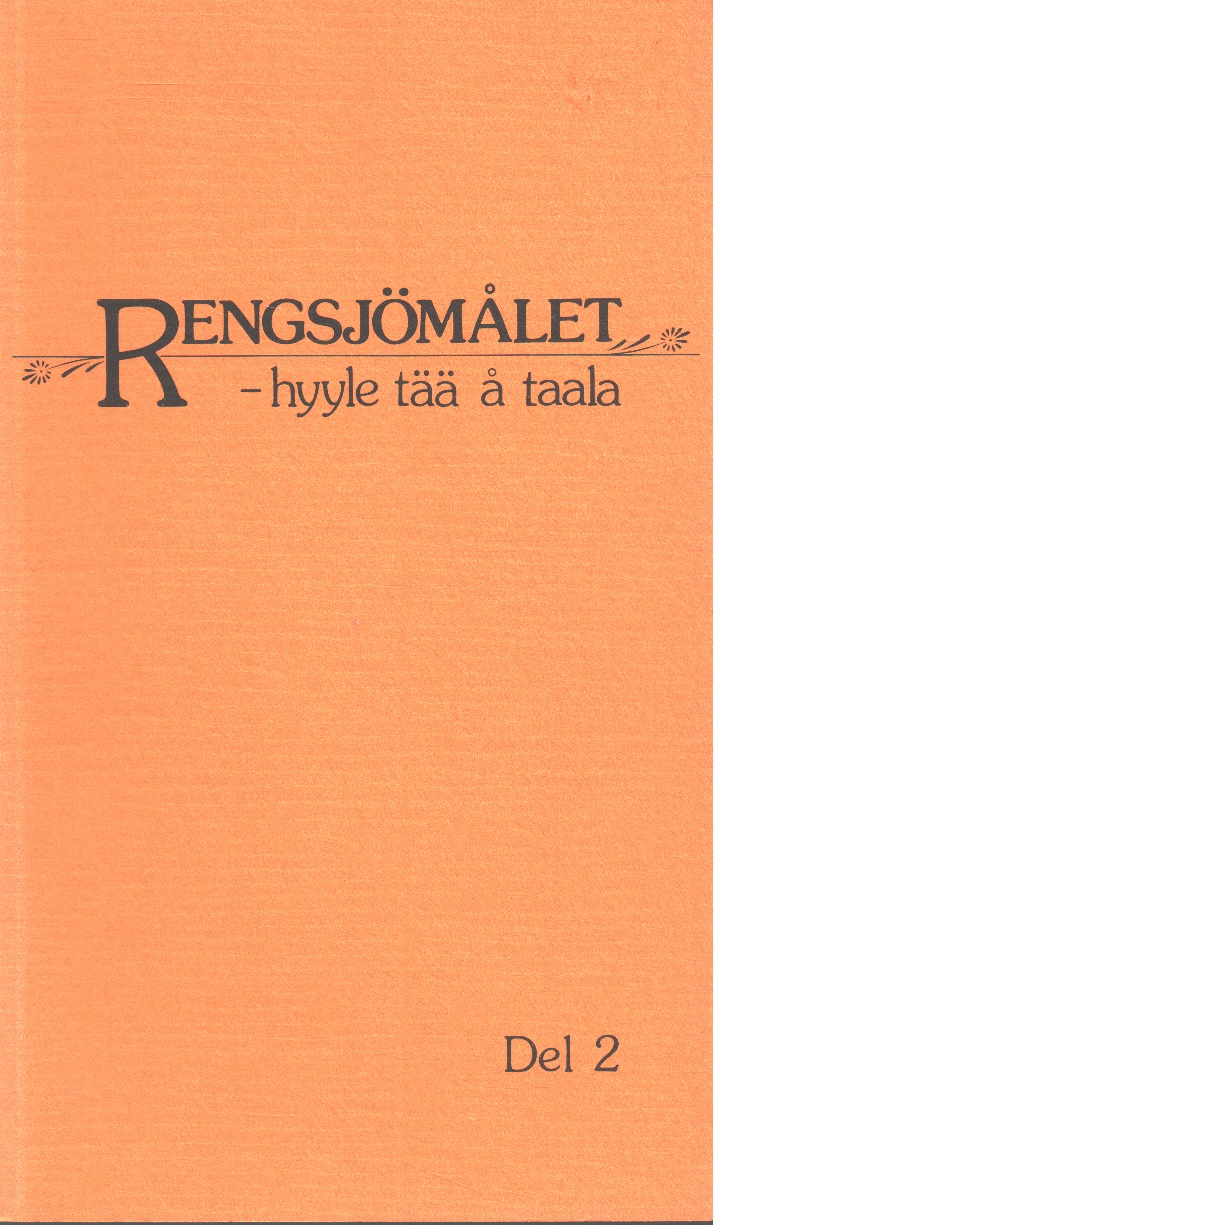 Rengsjömålet - hyyle tää å taala. Del 2 - Nilsson Arne E.